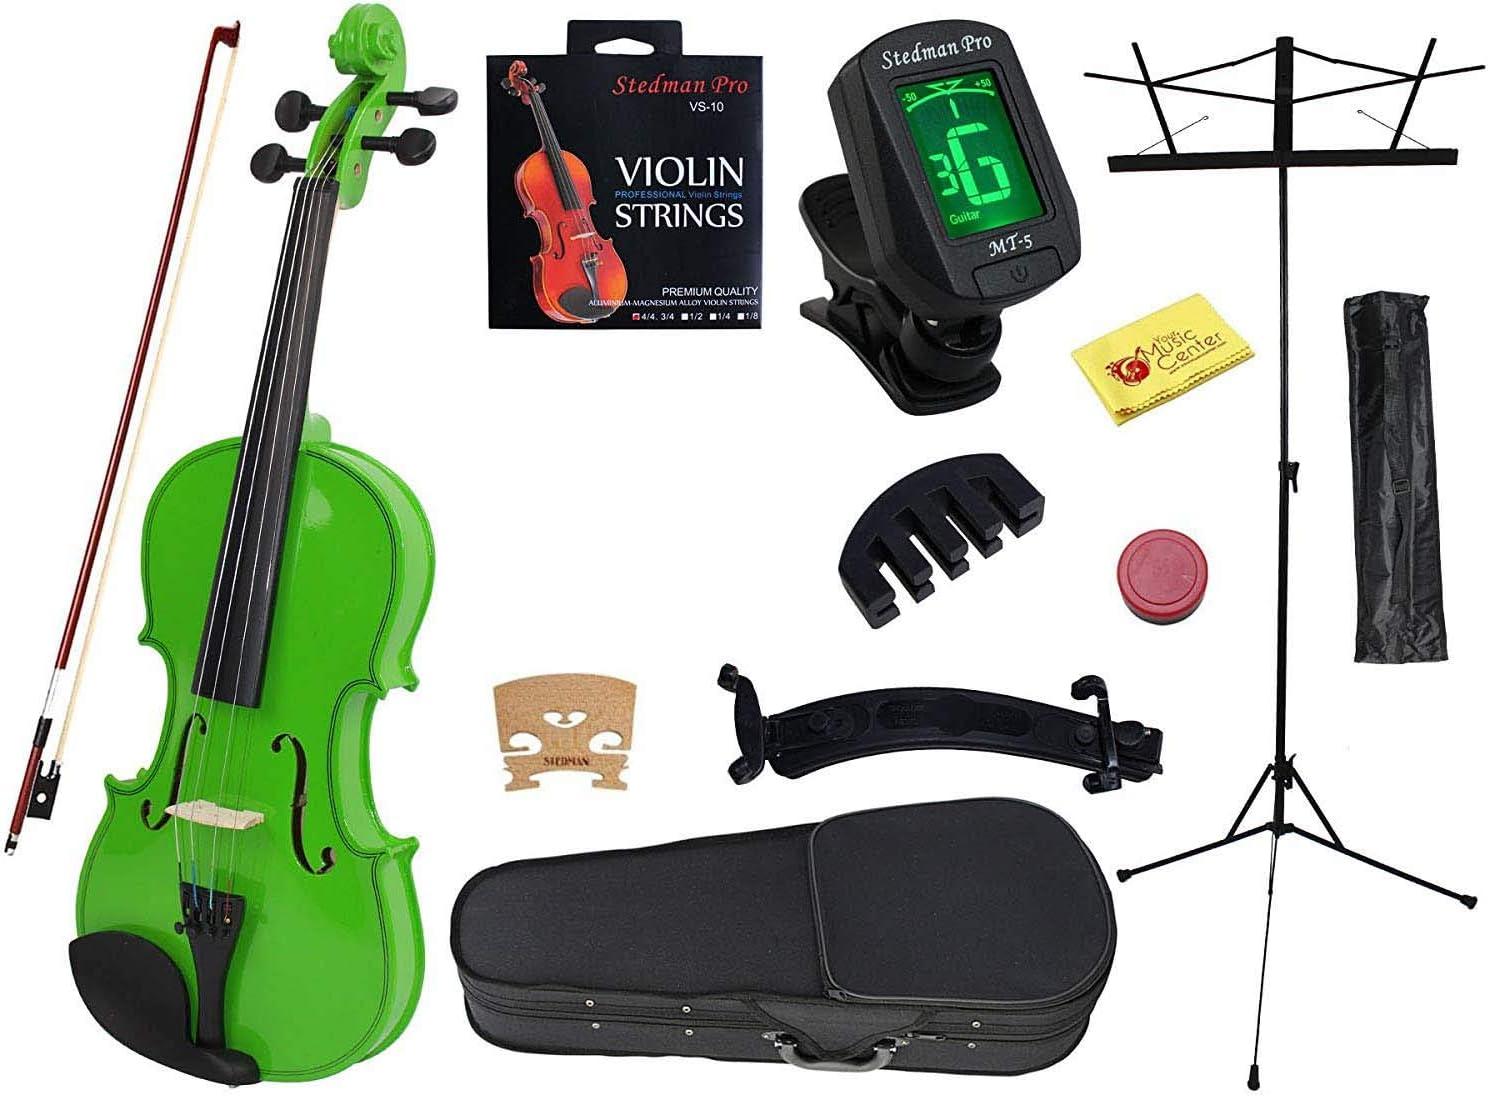 ymc 4/4 Tamaño Completo Handcrafted de Madera Maciza para estudiante de violín colimador Soporte de kits (con estuche duro, arco, Música, afinador electrónico, arco, hombro, Silencio, cuerdas extra, polaco Gamuza, colofonia): Amazon.es: